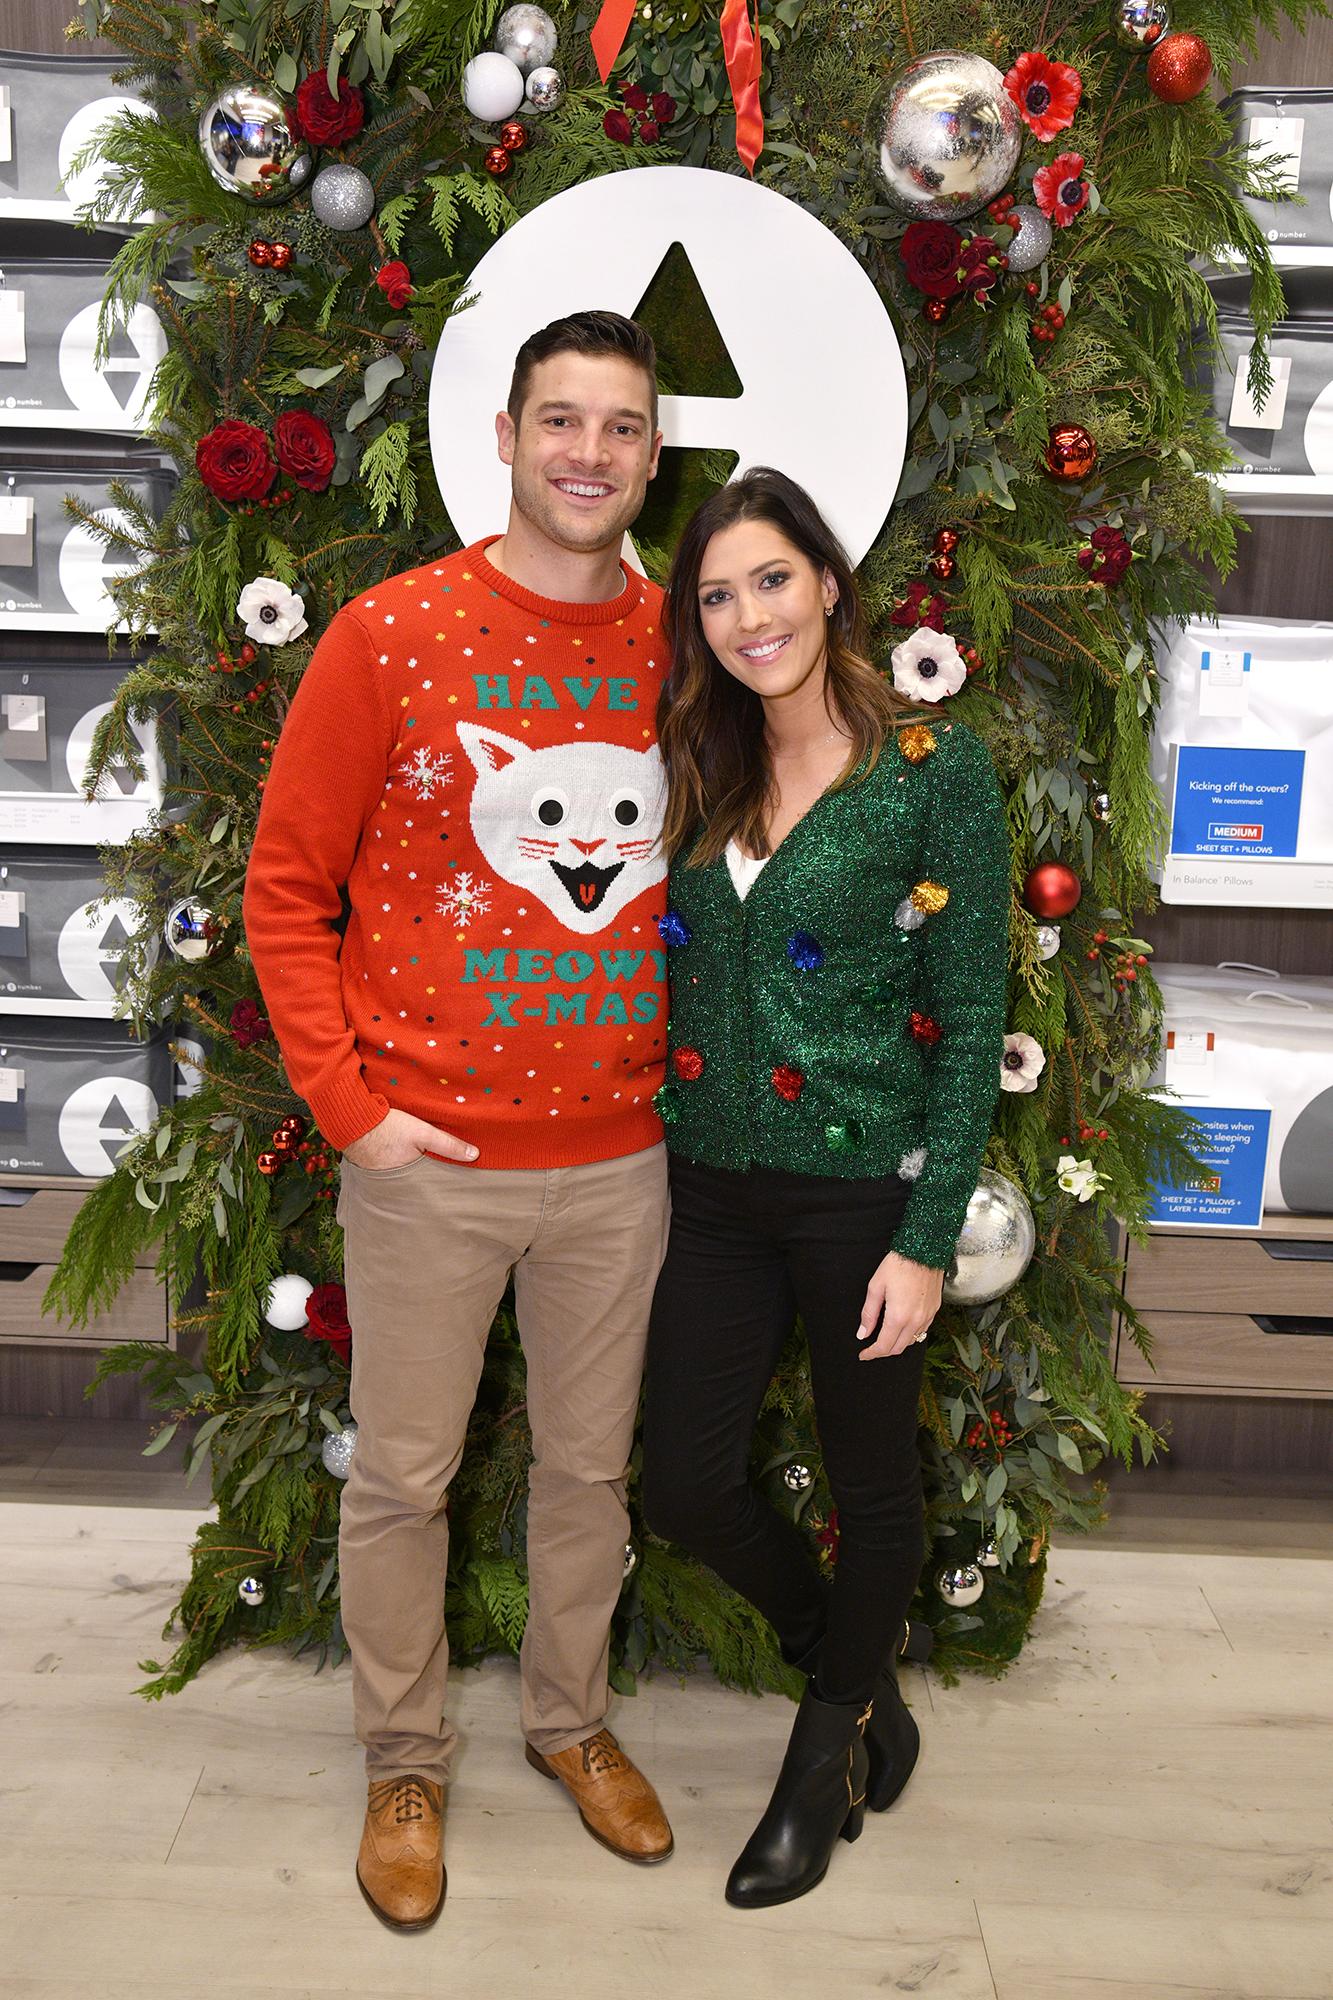 Becca Kufrin Garrett Yrigoyen Holidays - The Bachelorette couple wore festive holiday sweaters at an event in NYC.